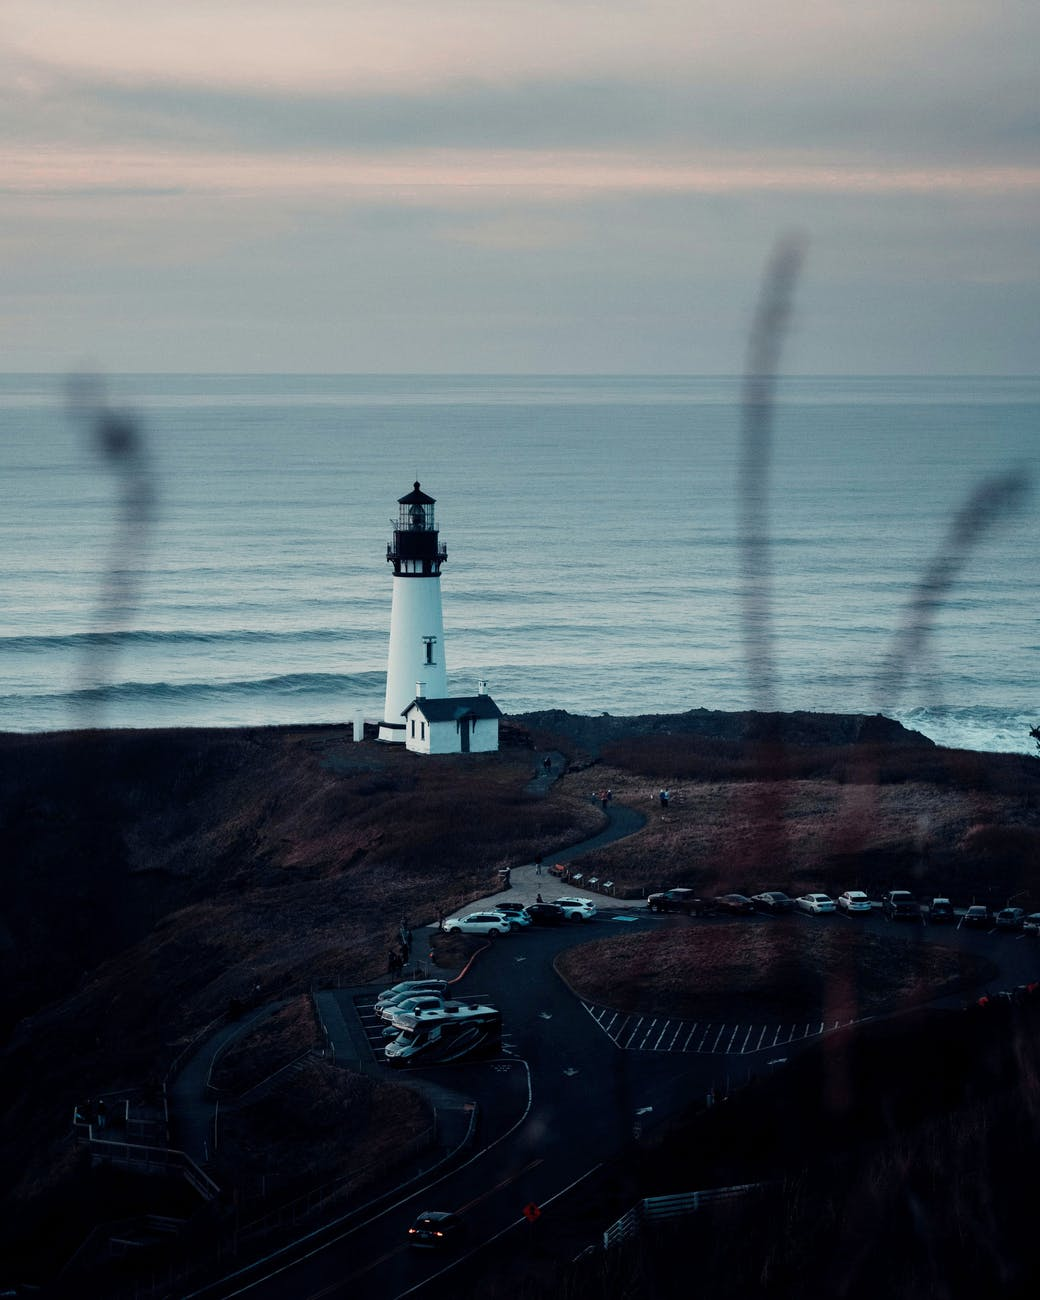 lighthouse on seashore under cloudless sky